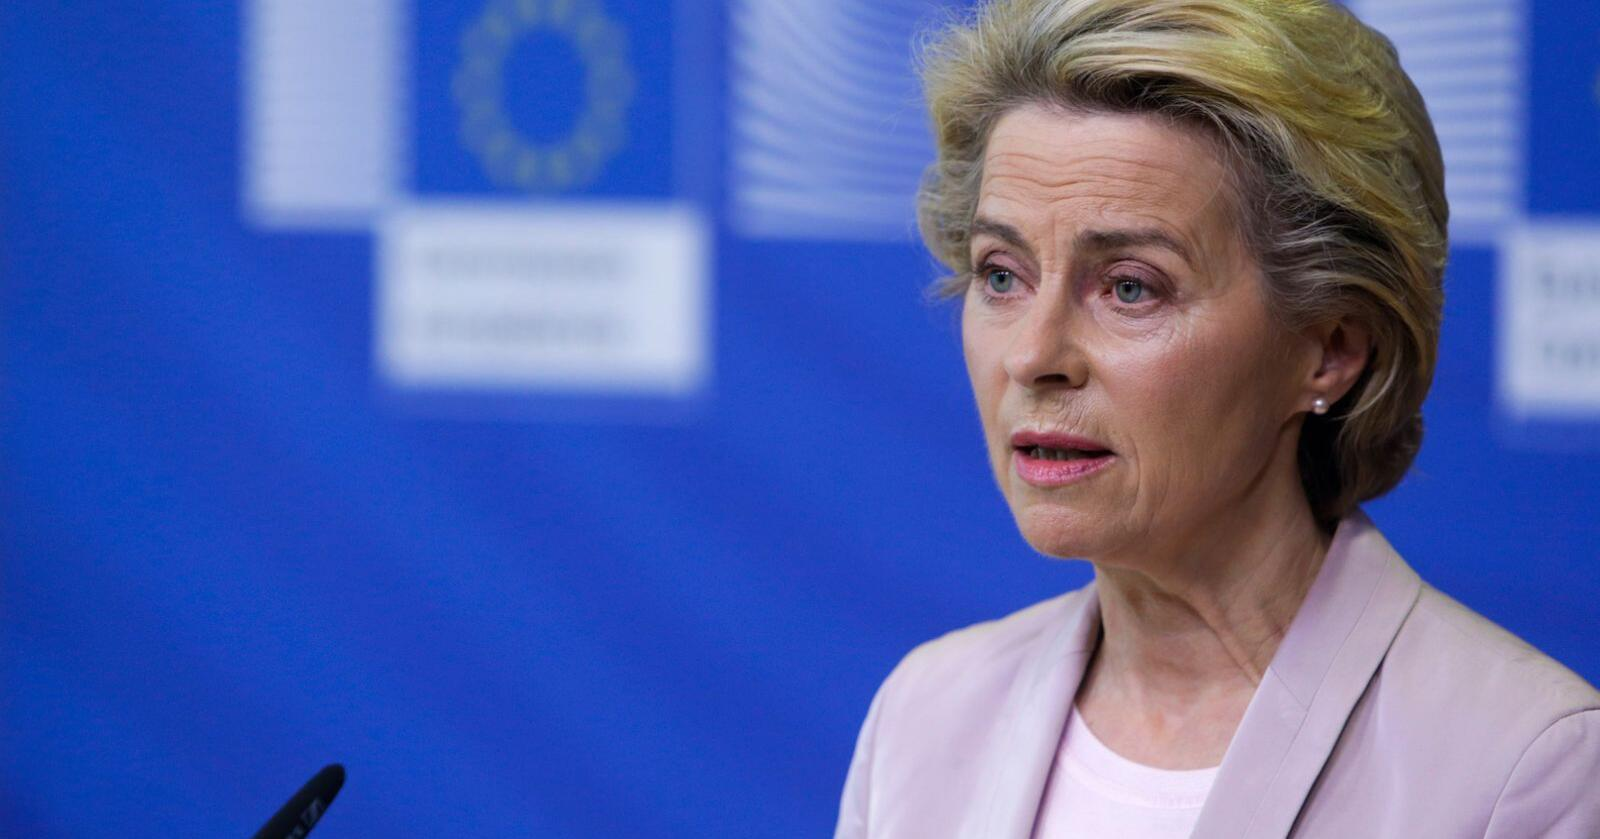 Som ventet tar Ursula von der Leyen til orde for større klimakutt i det kommende tiåret enn det som har vært EUs mål hittil. Foto: Aris Oikonomou / AP / NTB